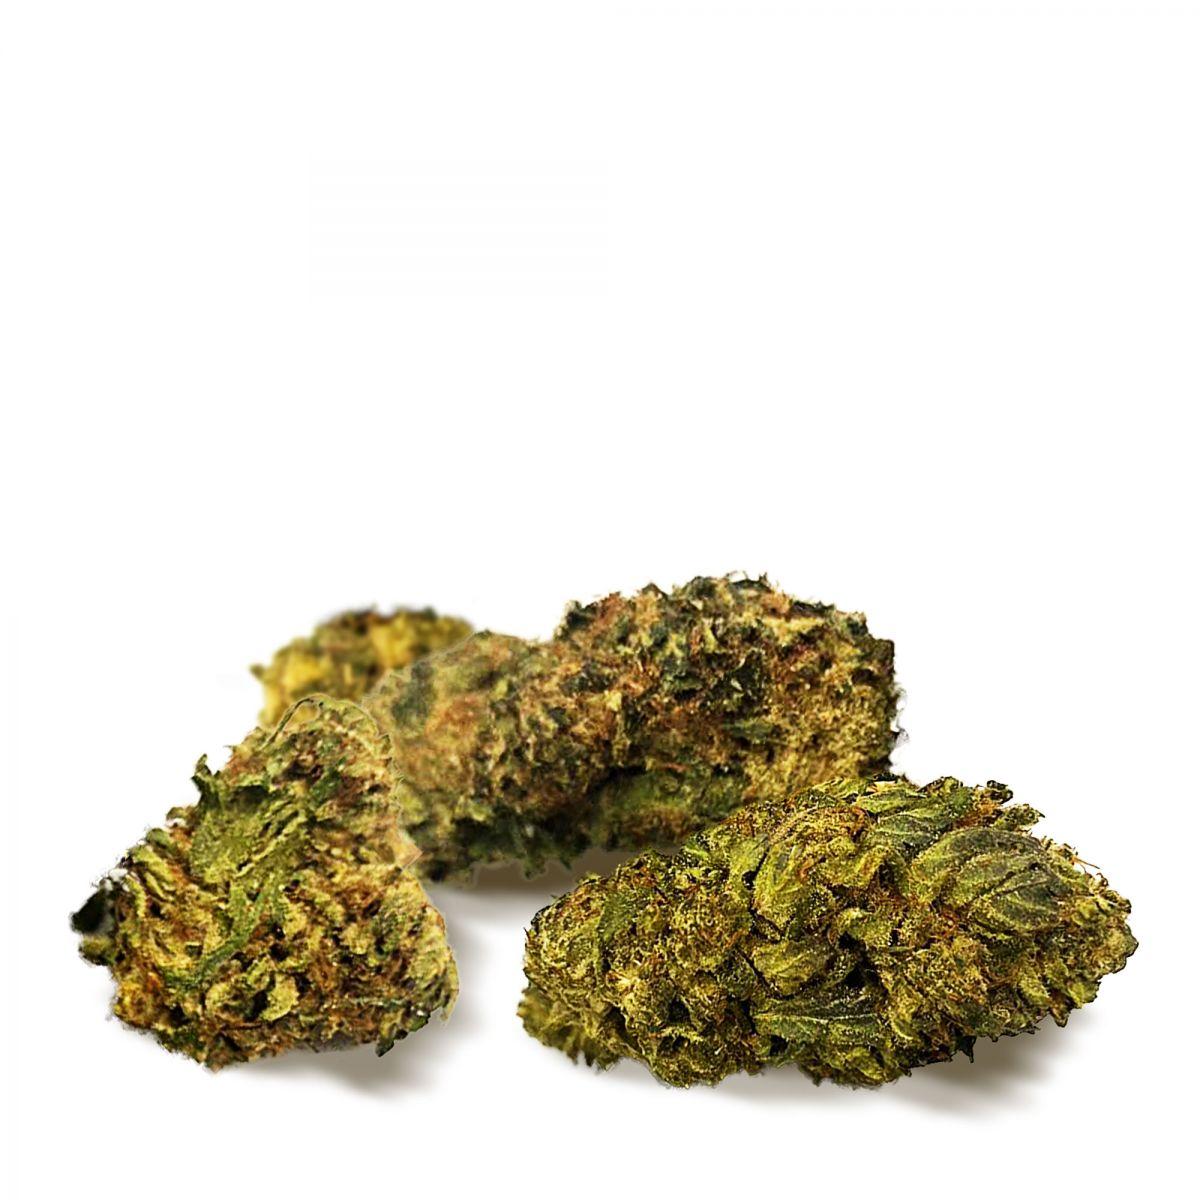 premium-delta-8-thc-hemp-flower-bubba-kush